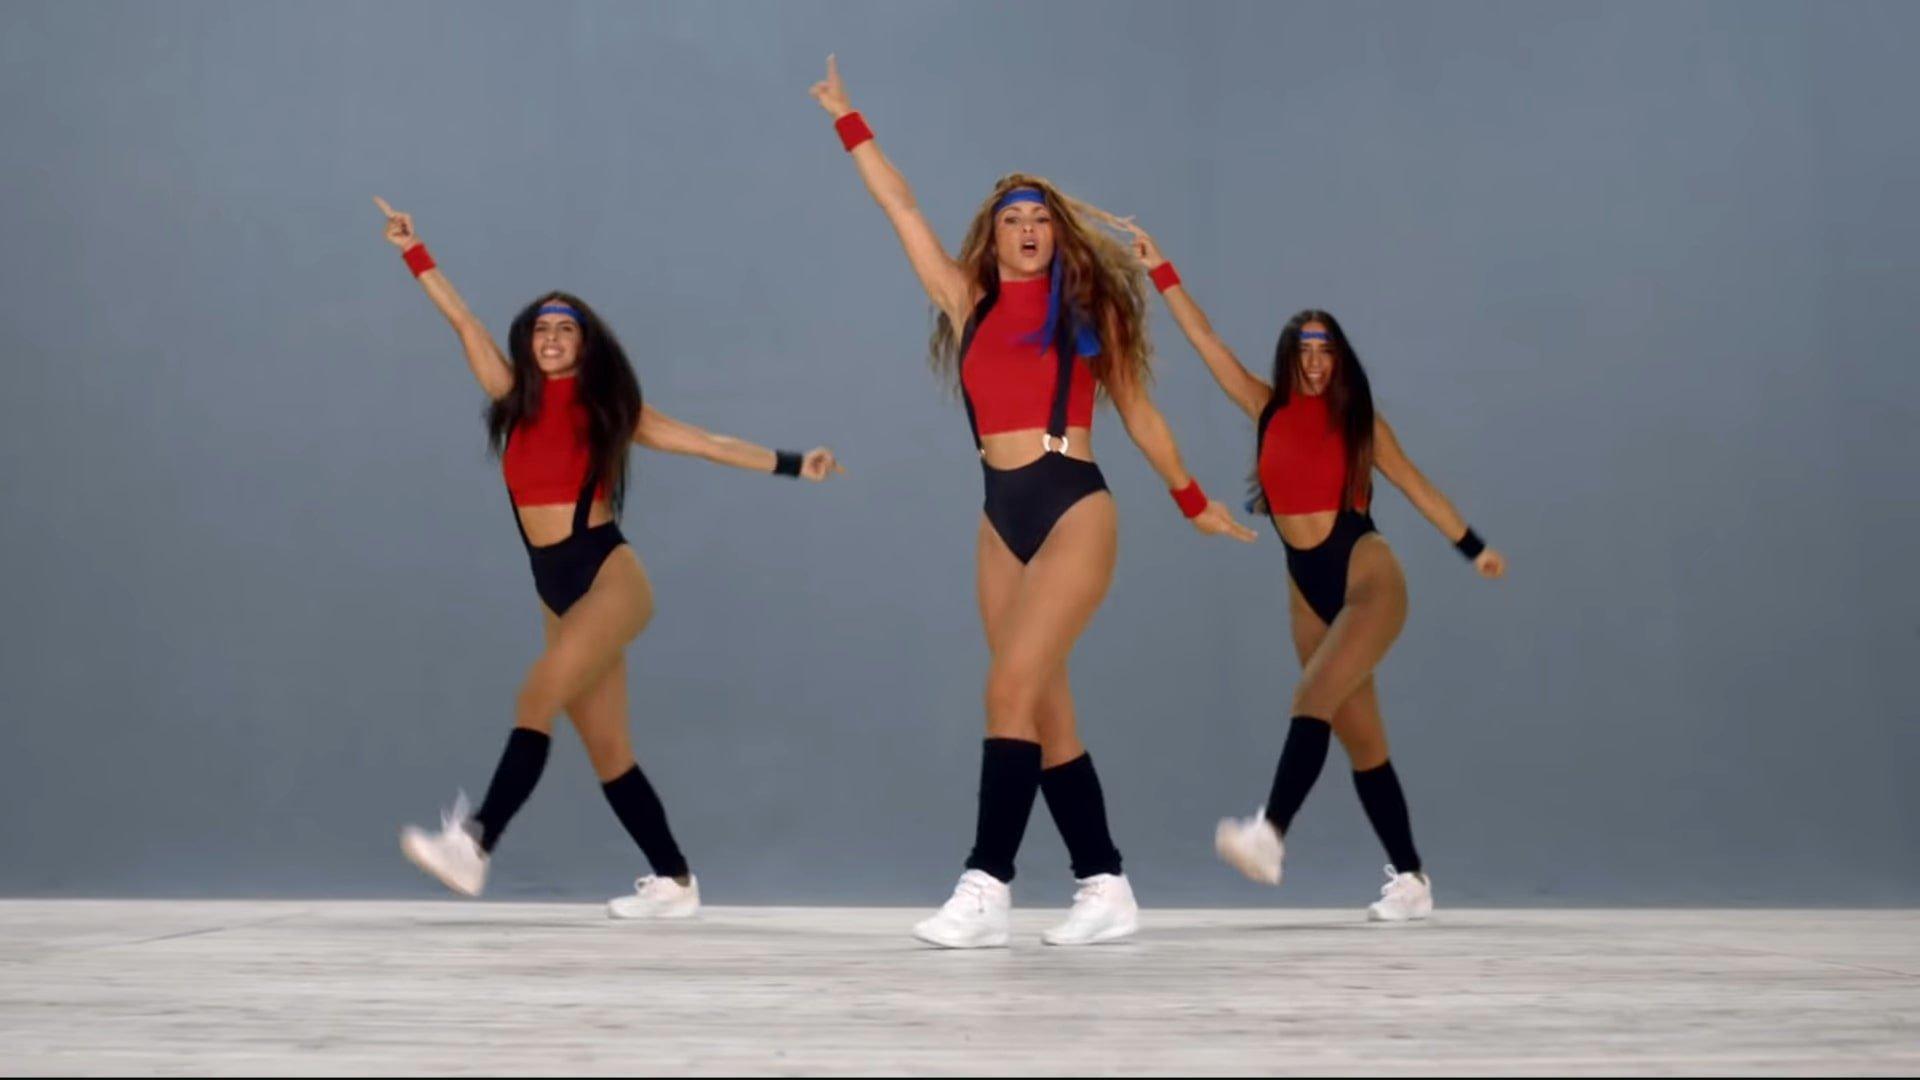 Black Eyed Peas, Shakira - GIRL LIKE ME (Official Music Video) 0-59 Screenshot